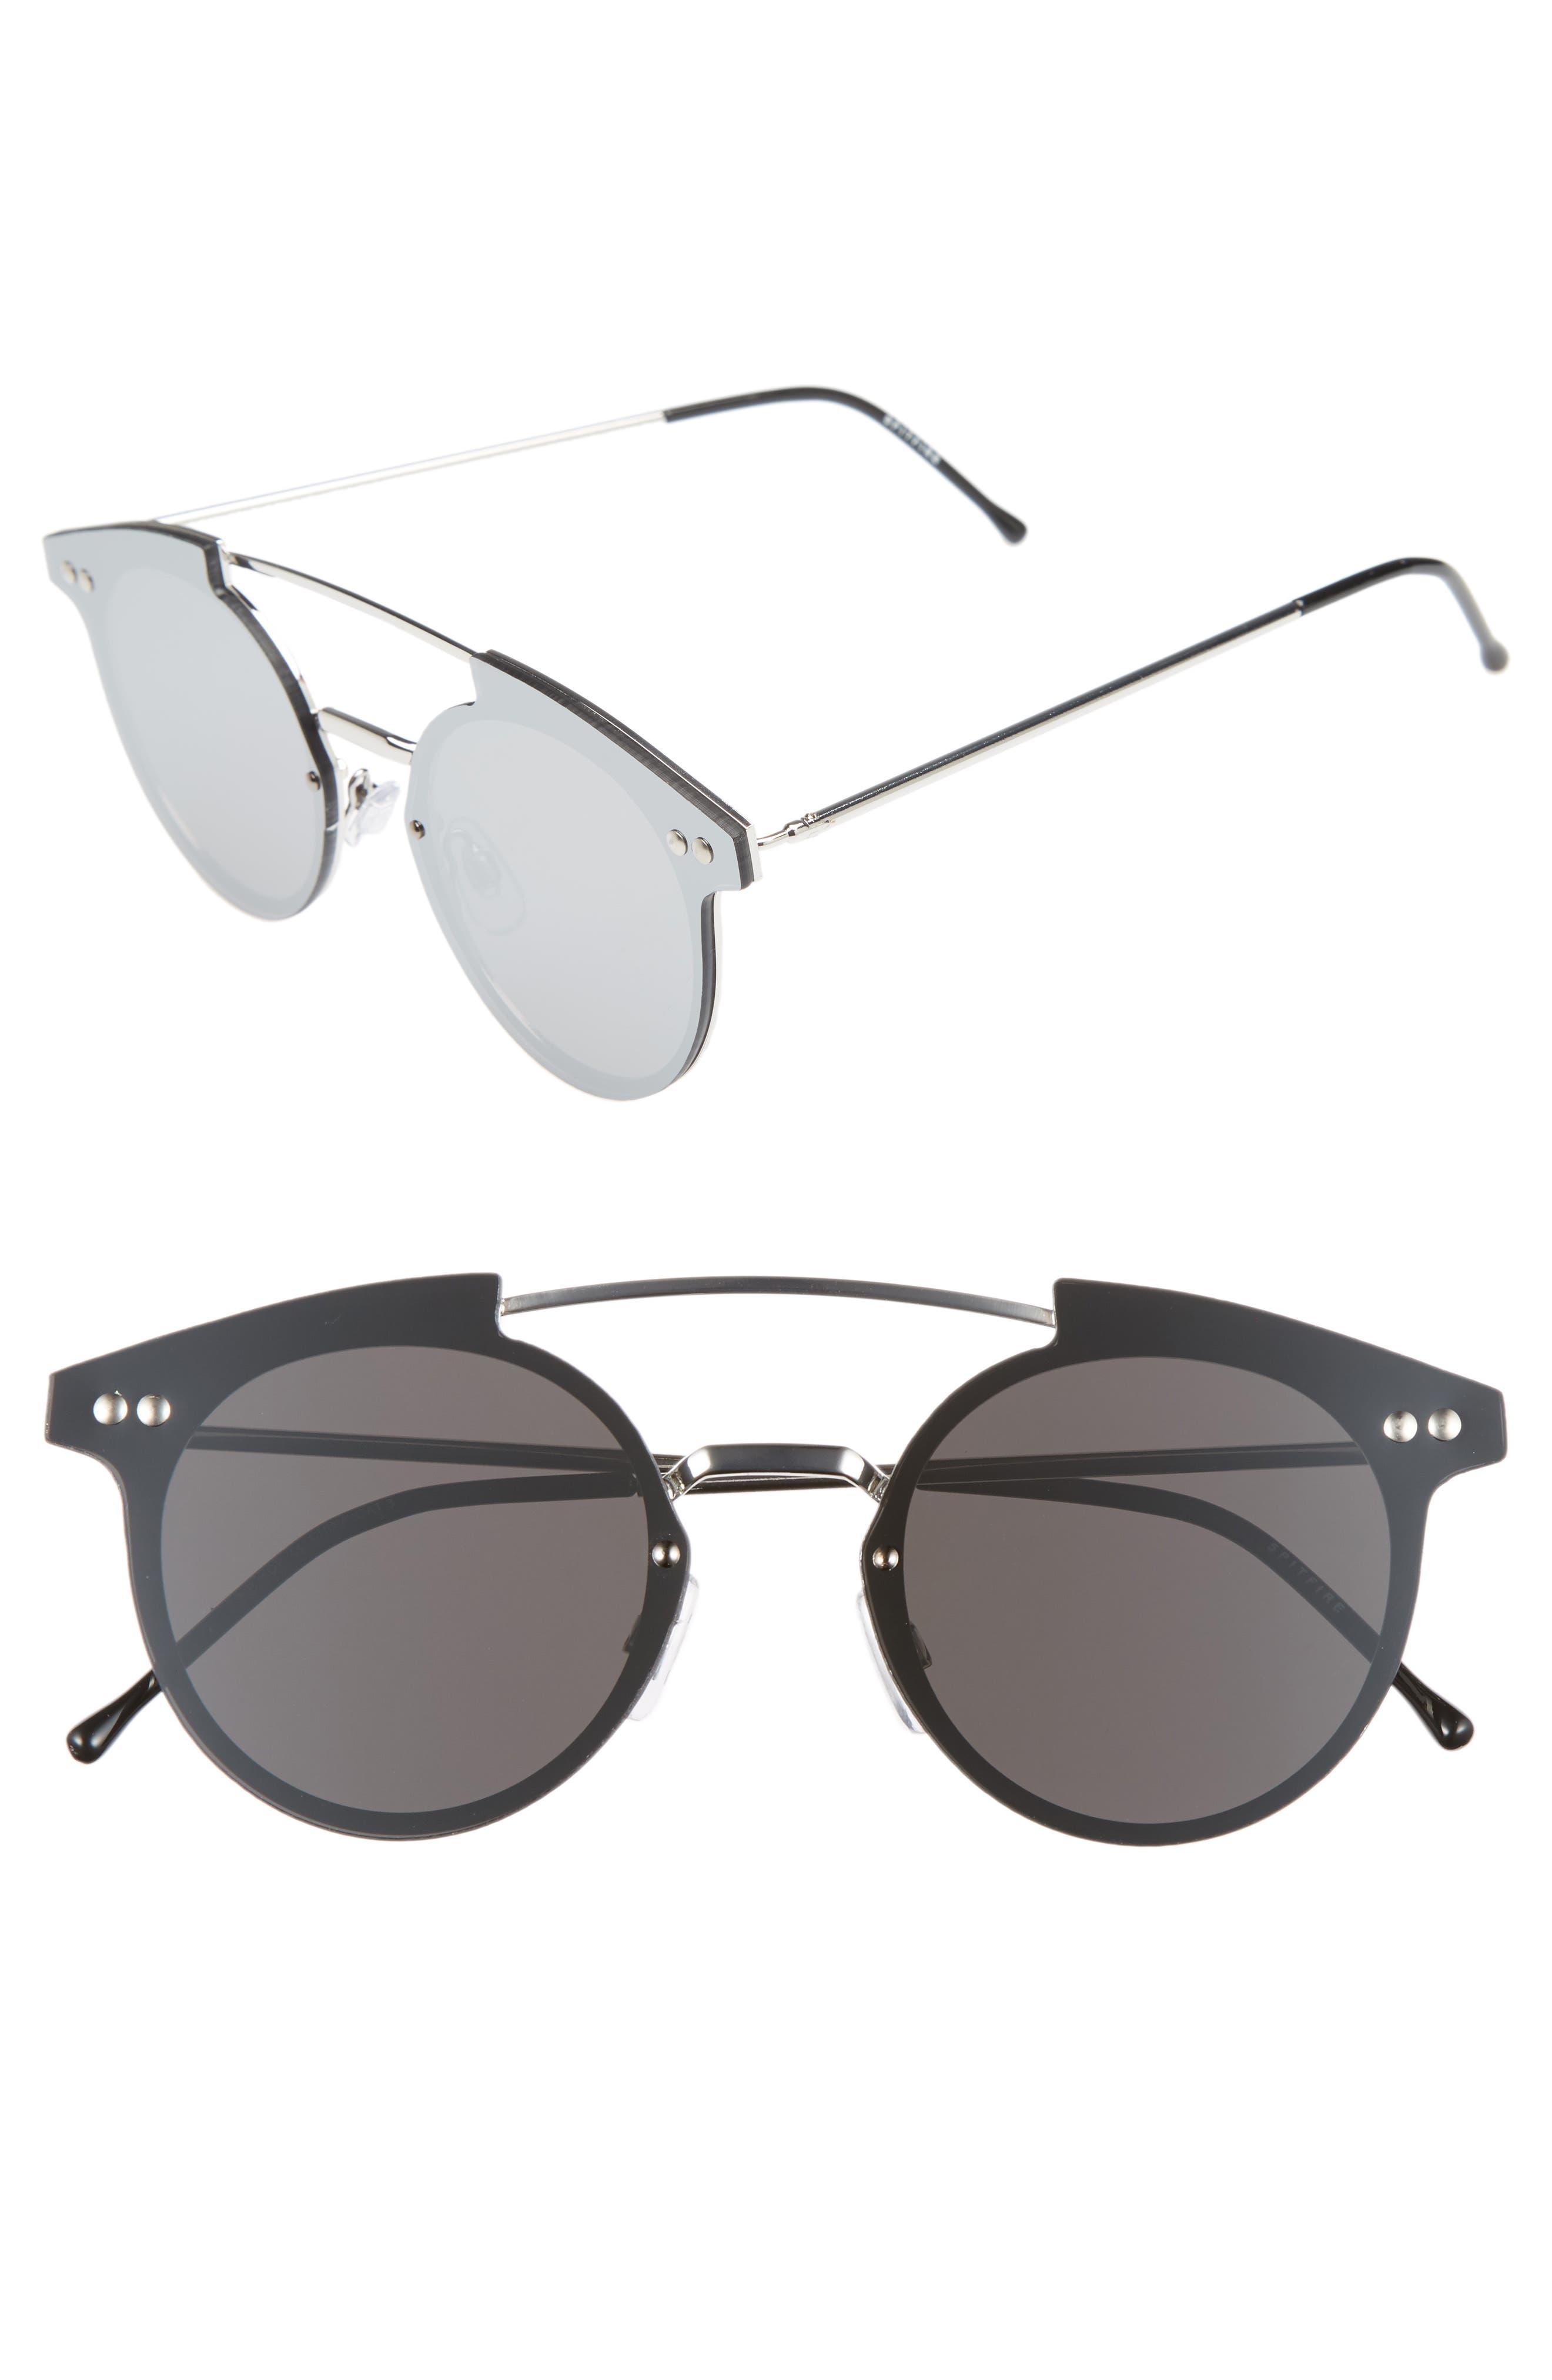 Spitfire Trip Hop 55mm Sunglasses